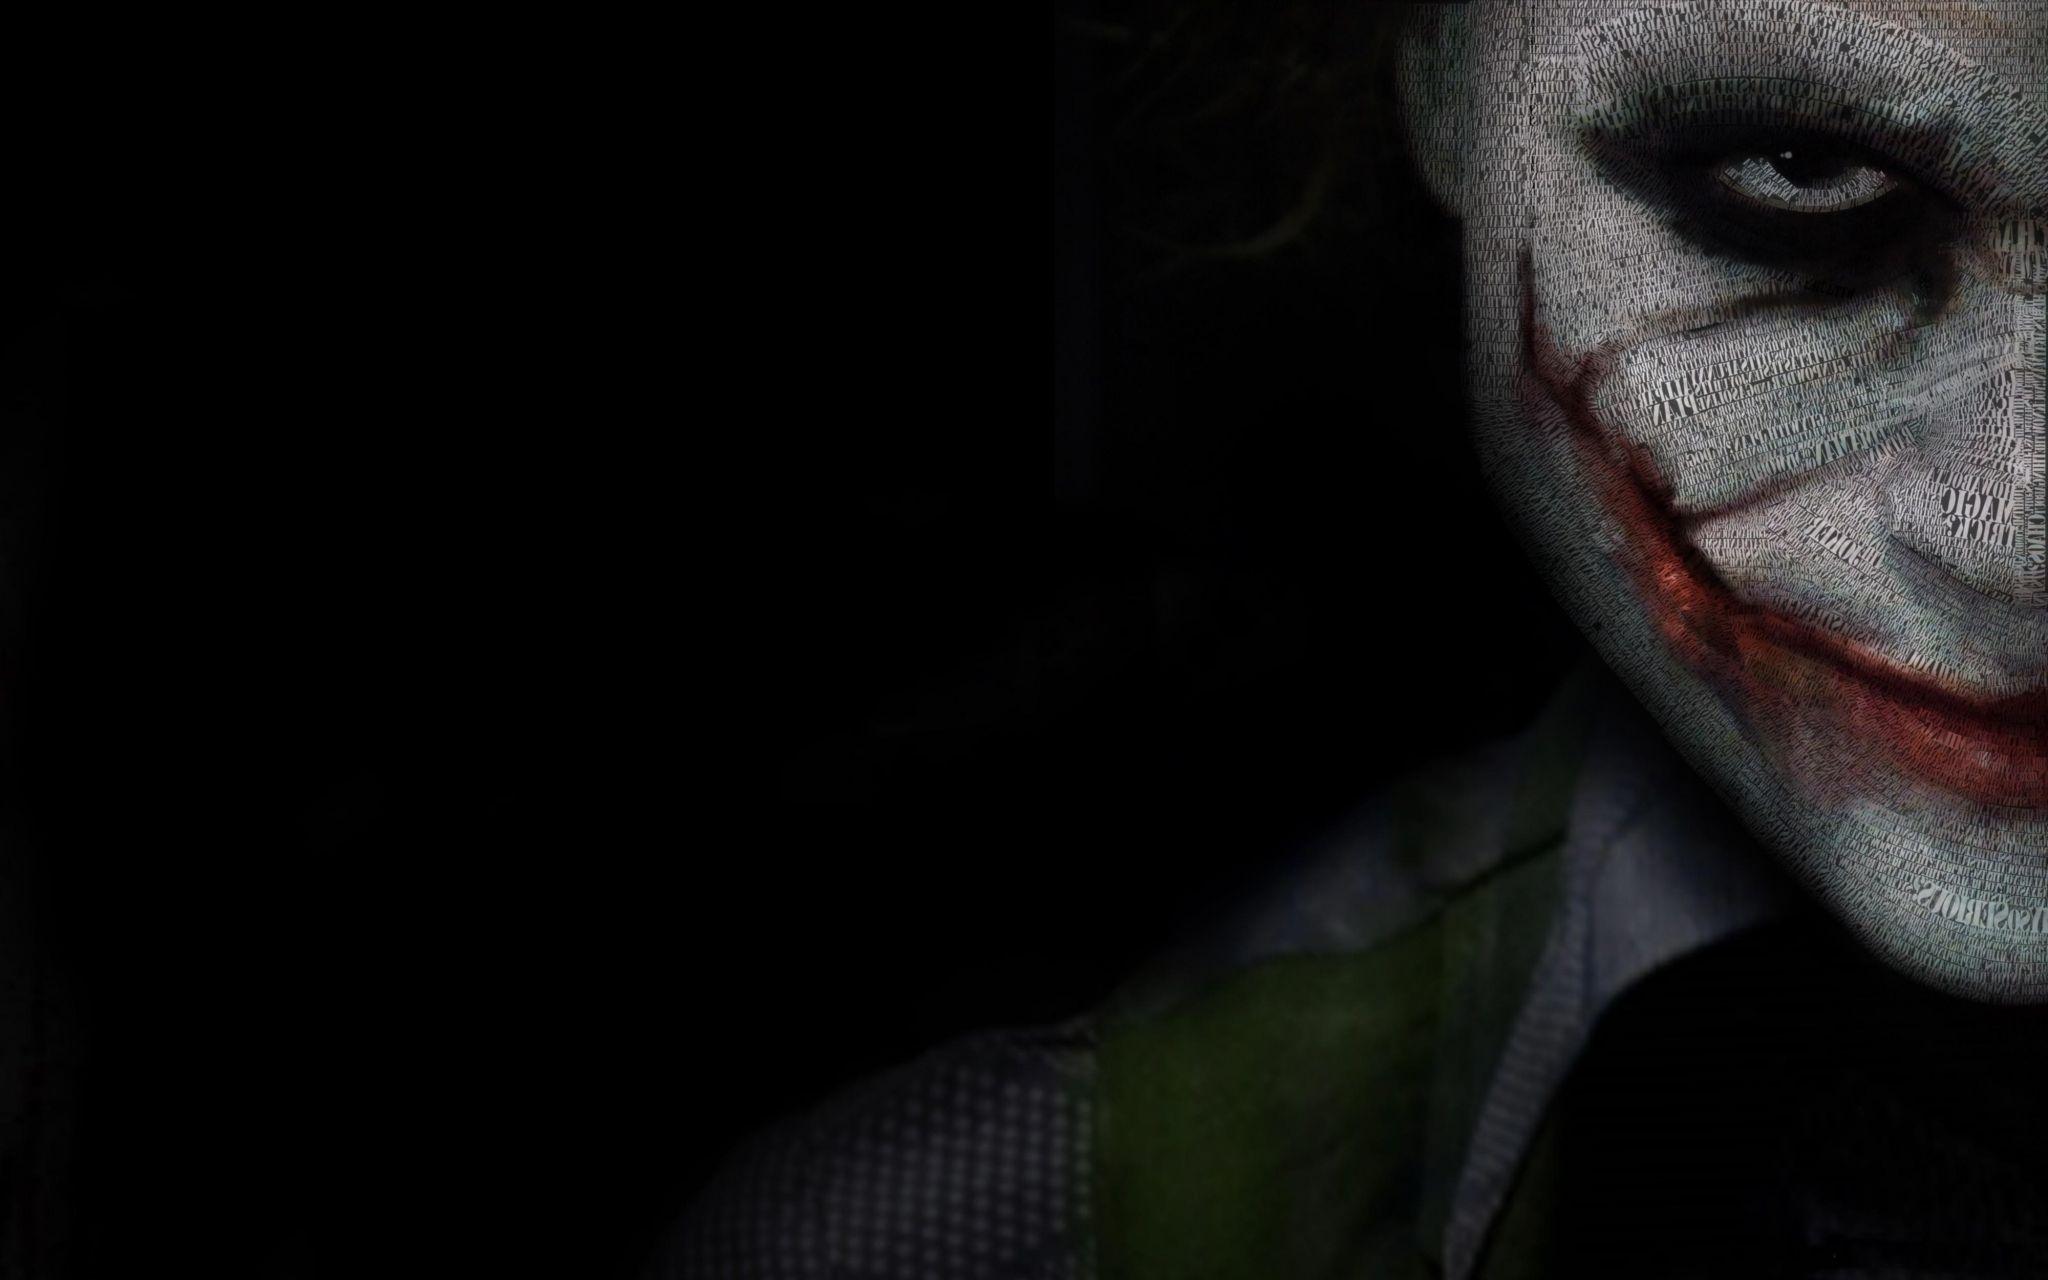 Joker Pictures Desktop Joker Pics Joker Wallpapers Joker Hd Wallpaper